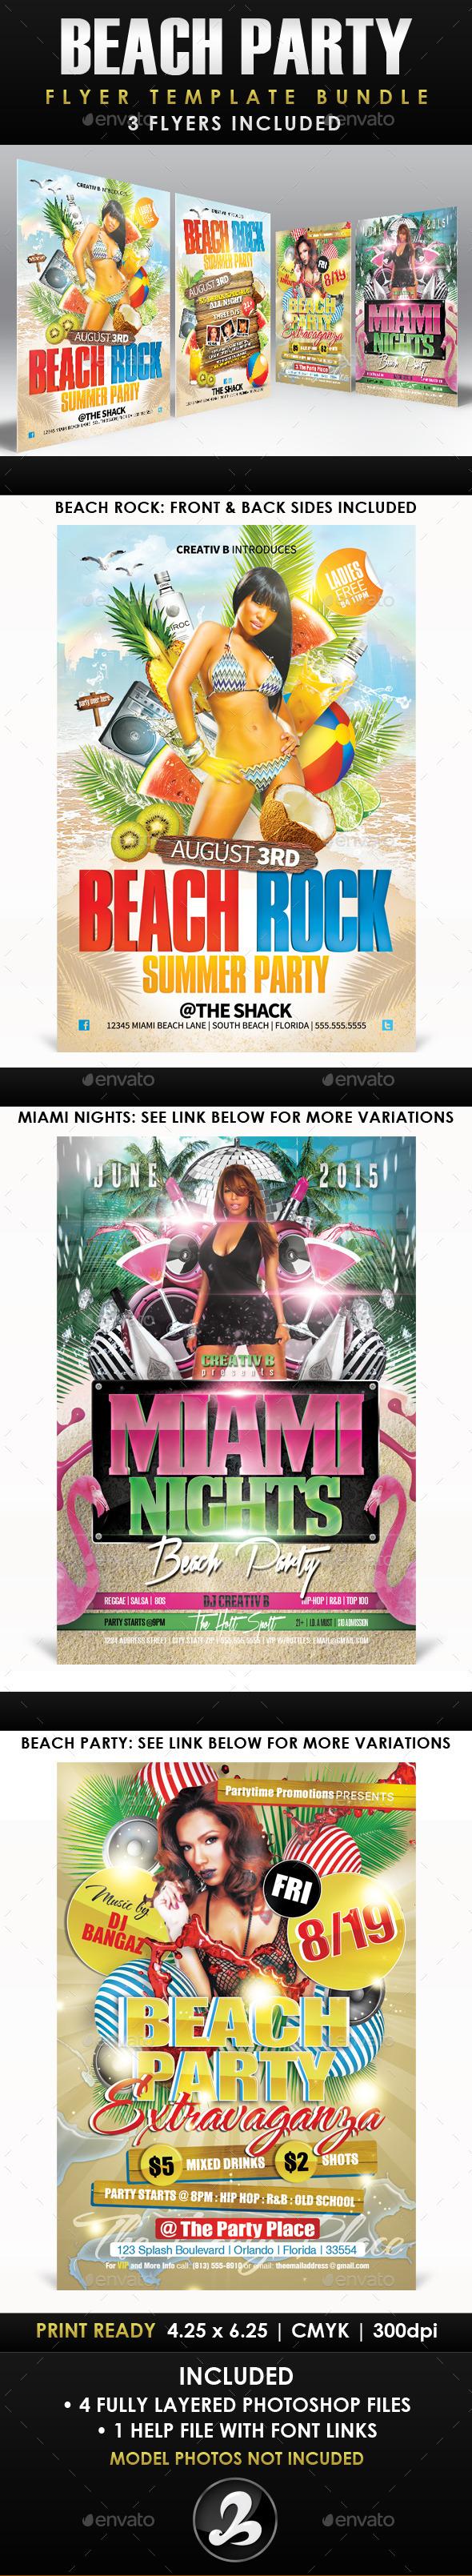 GraphicRiver Beach Party Flyer Template Bundle 10678531